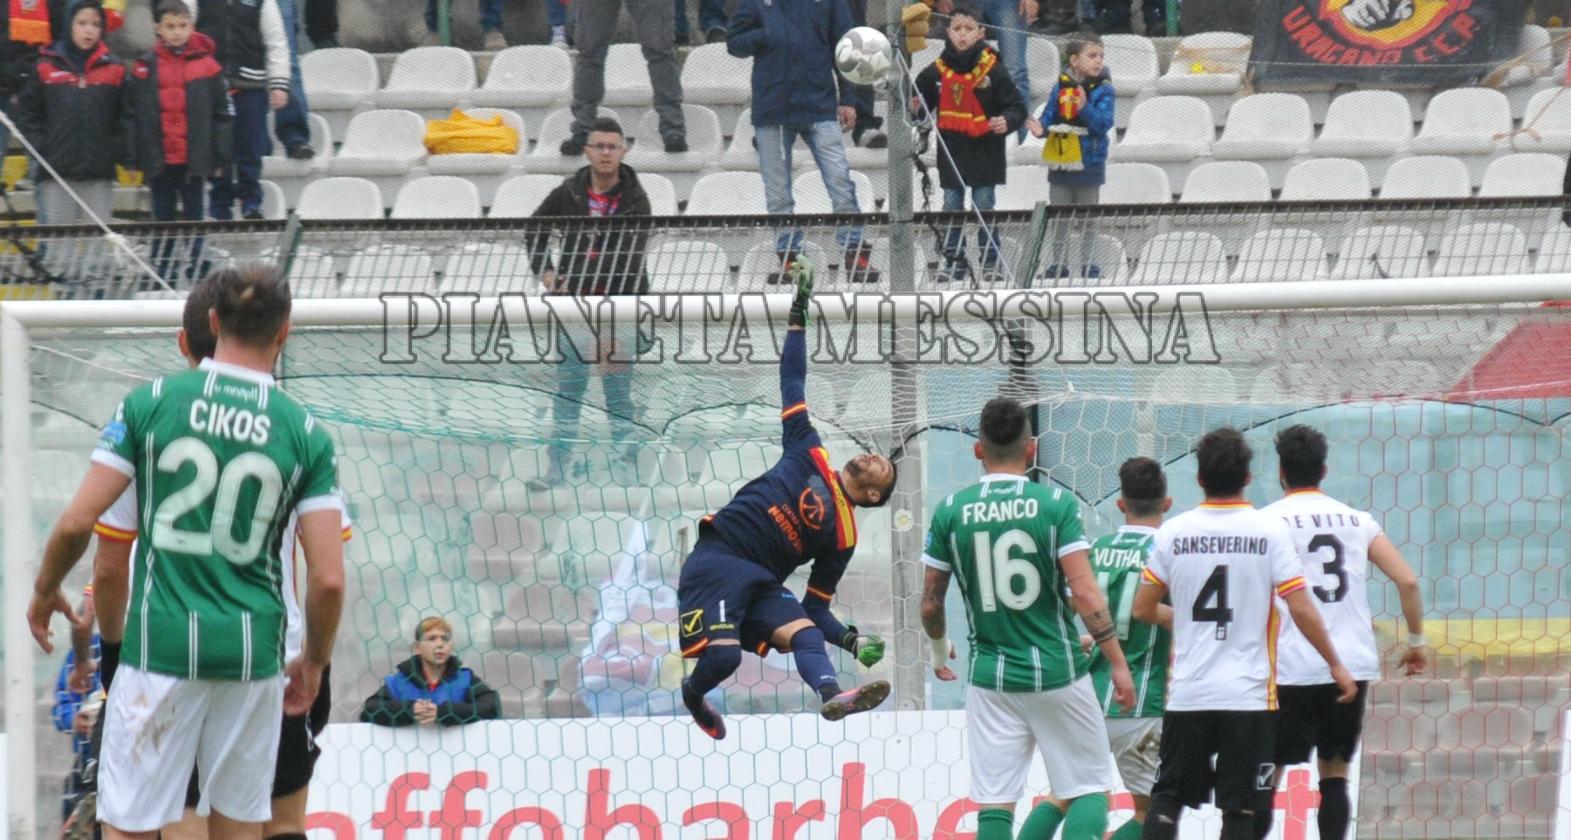 Respinta n corner di Berardi su tiro di Pinto